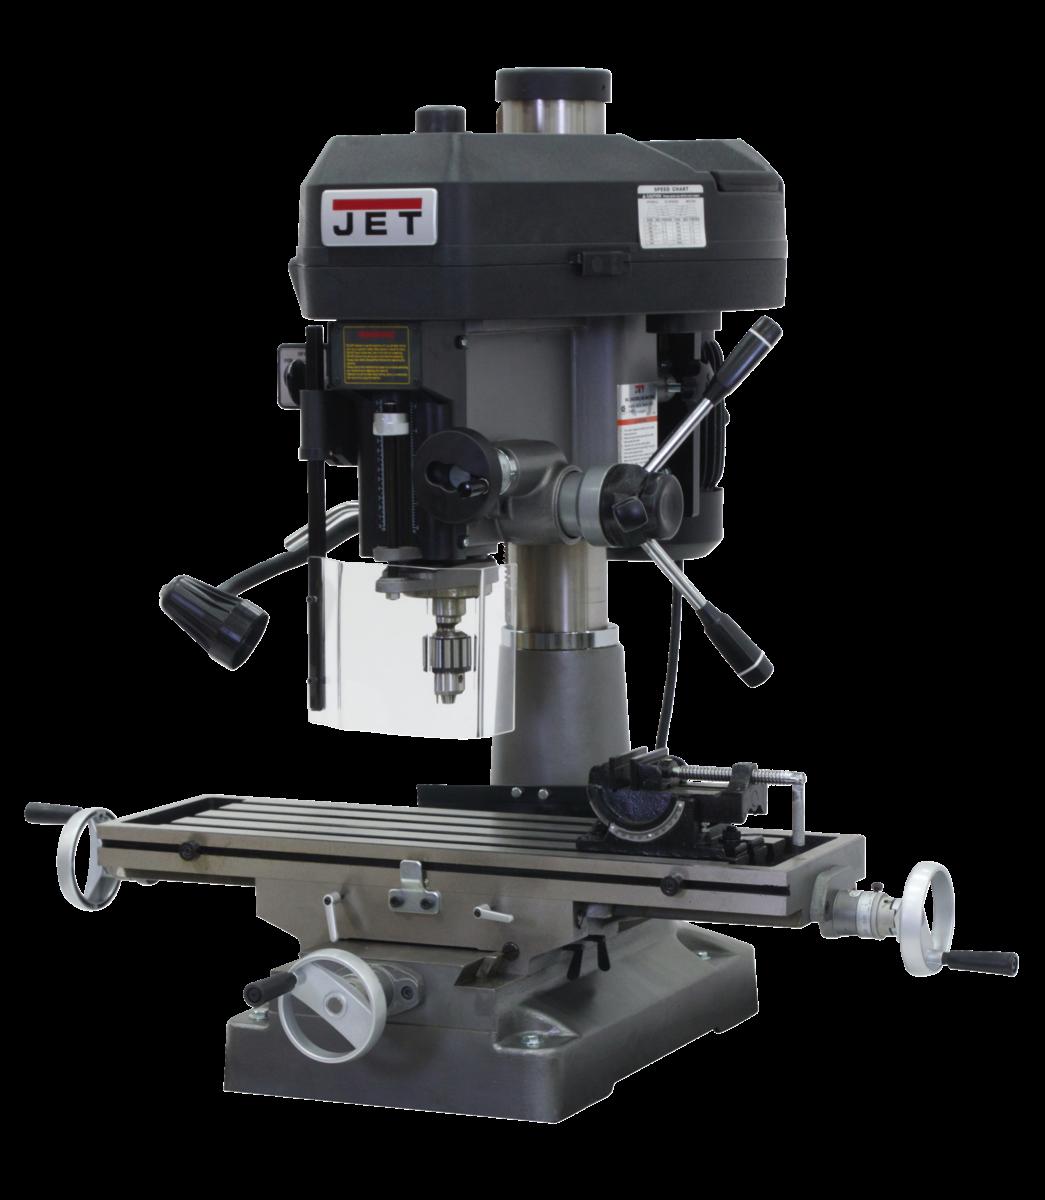 JMD-18 Mill/Drill With ACU-RITE 203 DRO